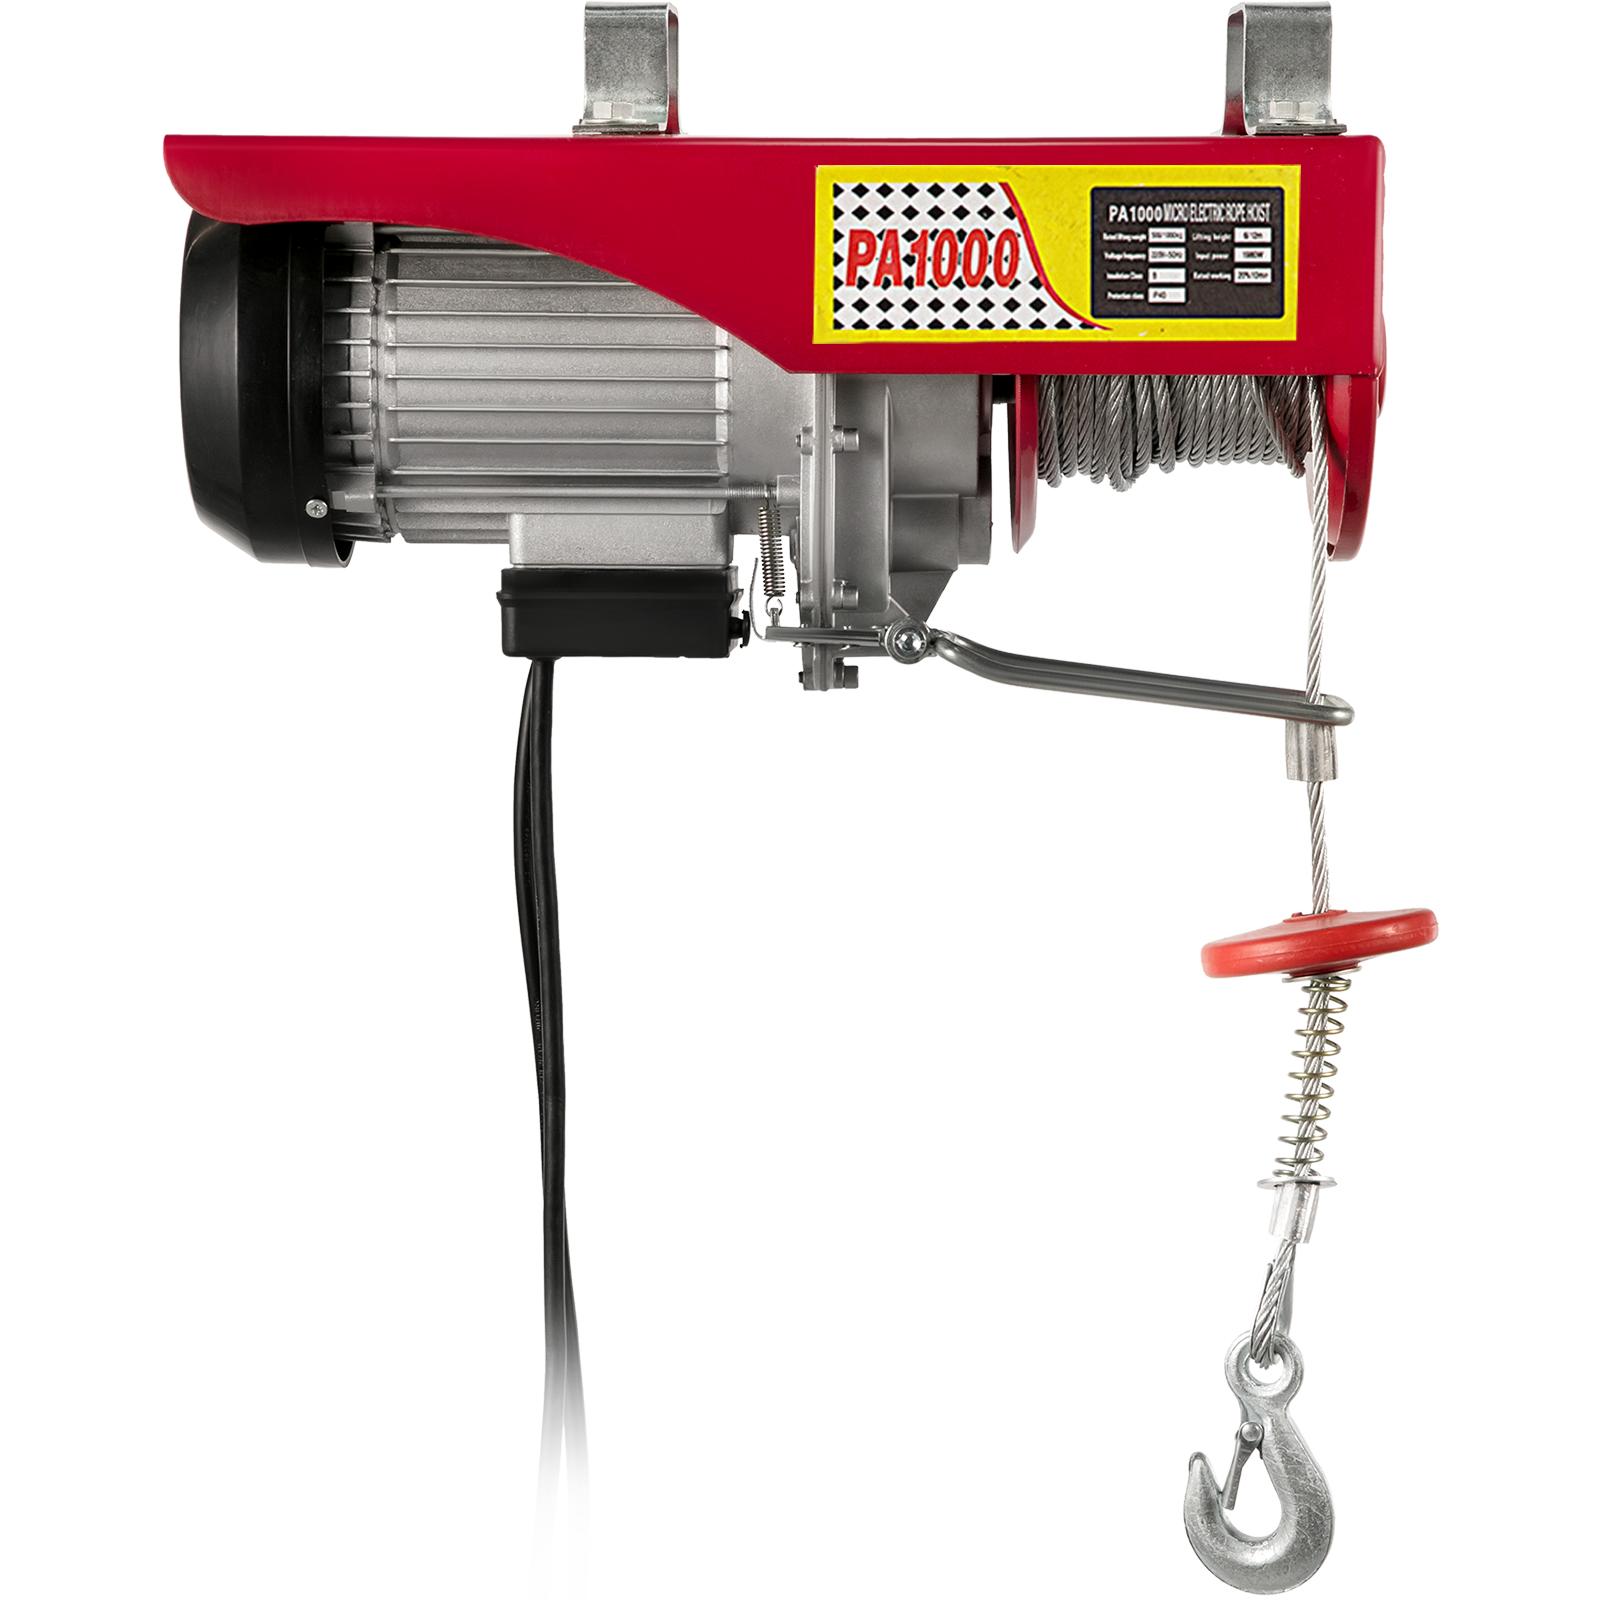 100kg-900kg-Electric-Hoist-Winch-Lifting-Engine-Crane-Cable-Lift-Hook-Garage miniature 83